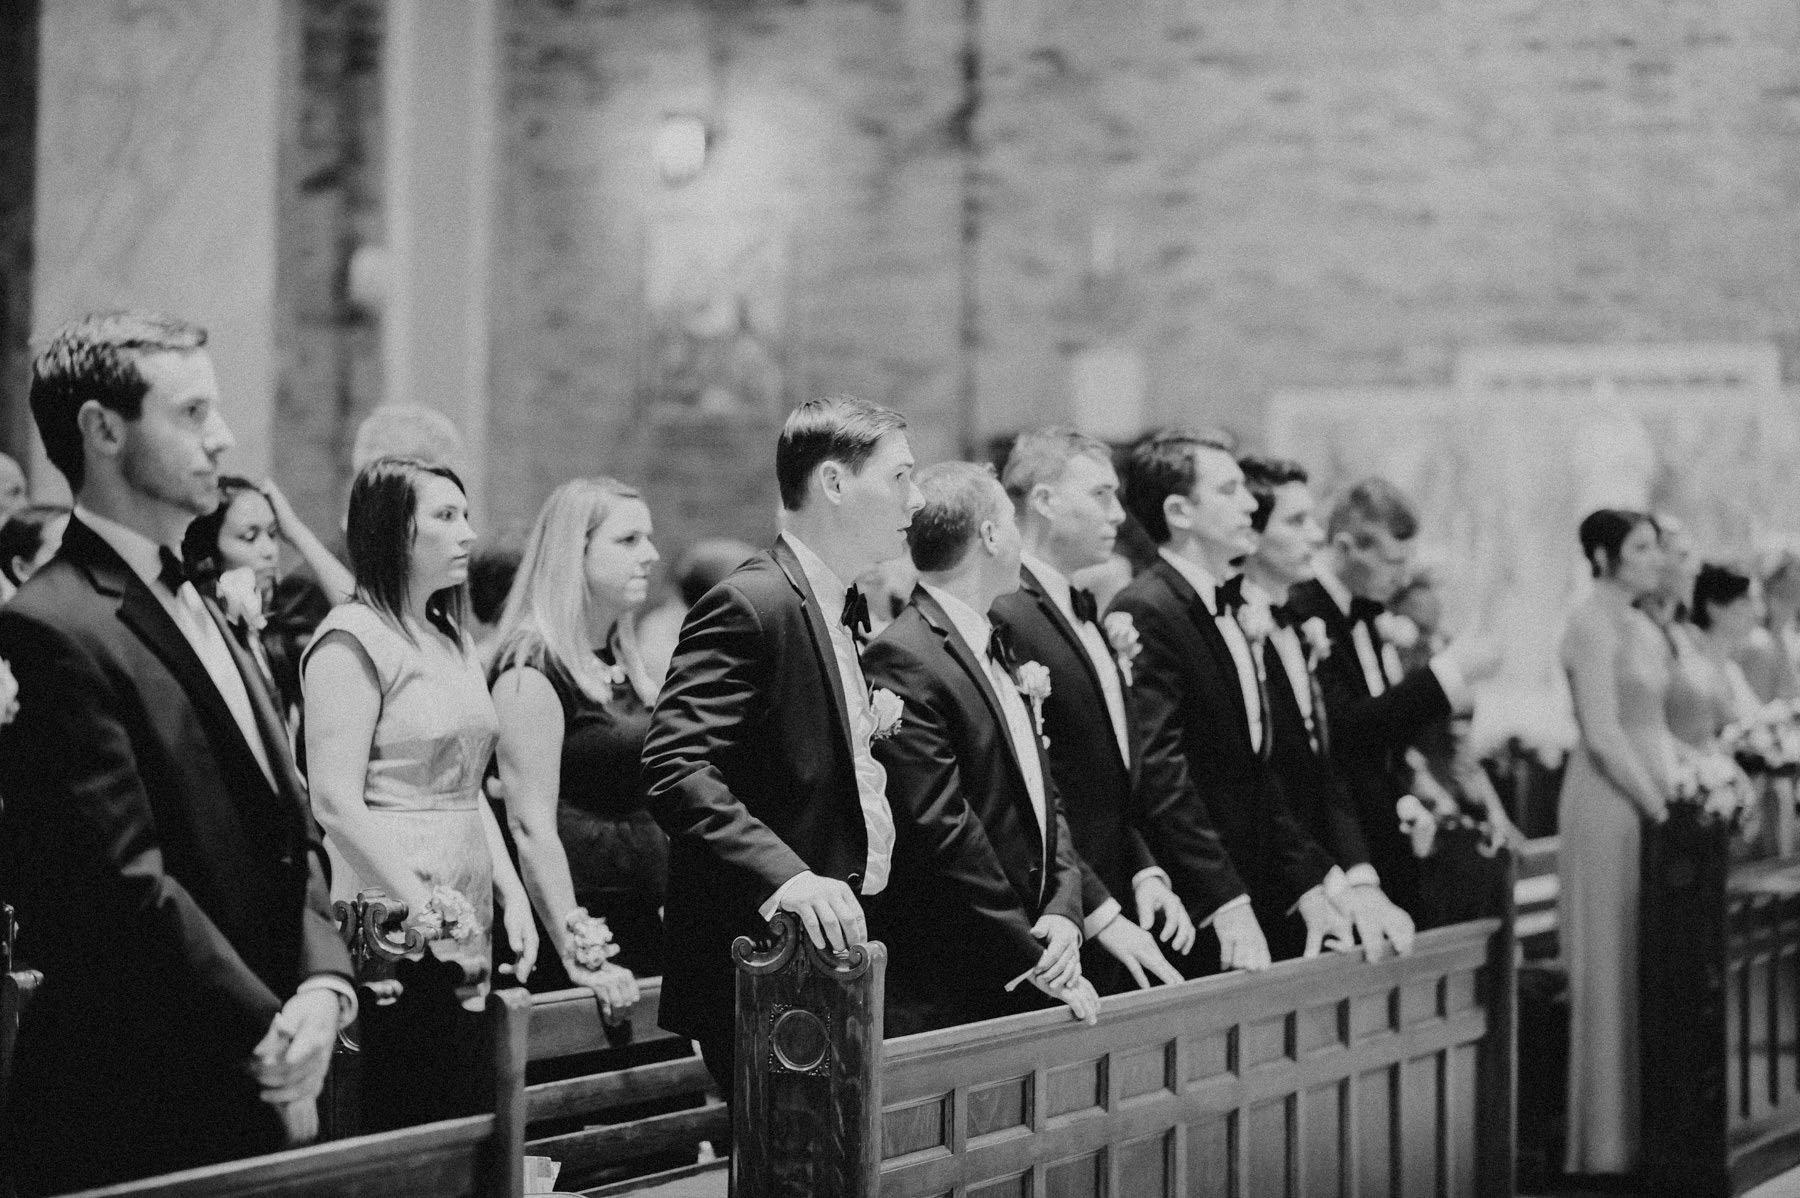 downtown-club-philadelphia-wedding-photographer-67.jpg